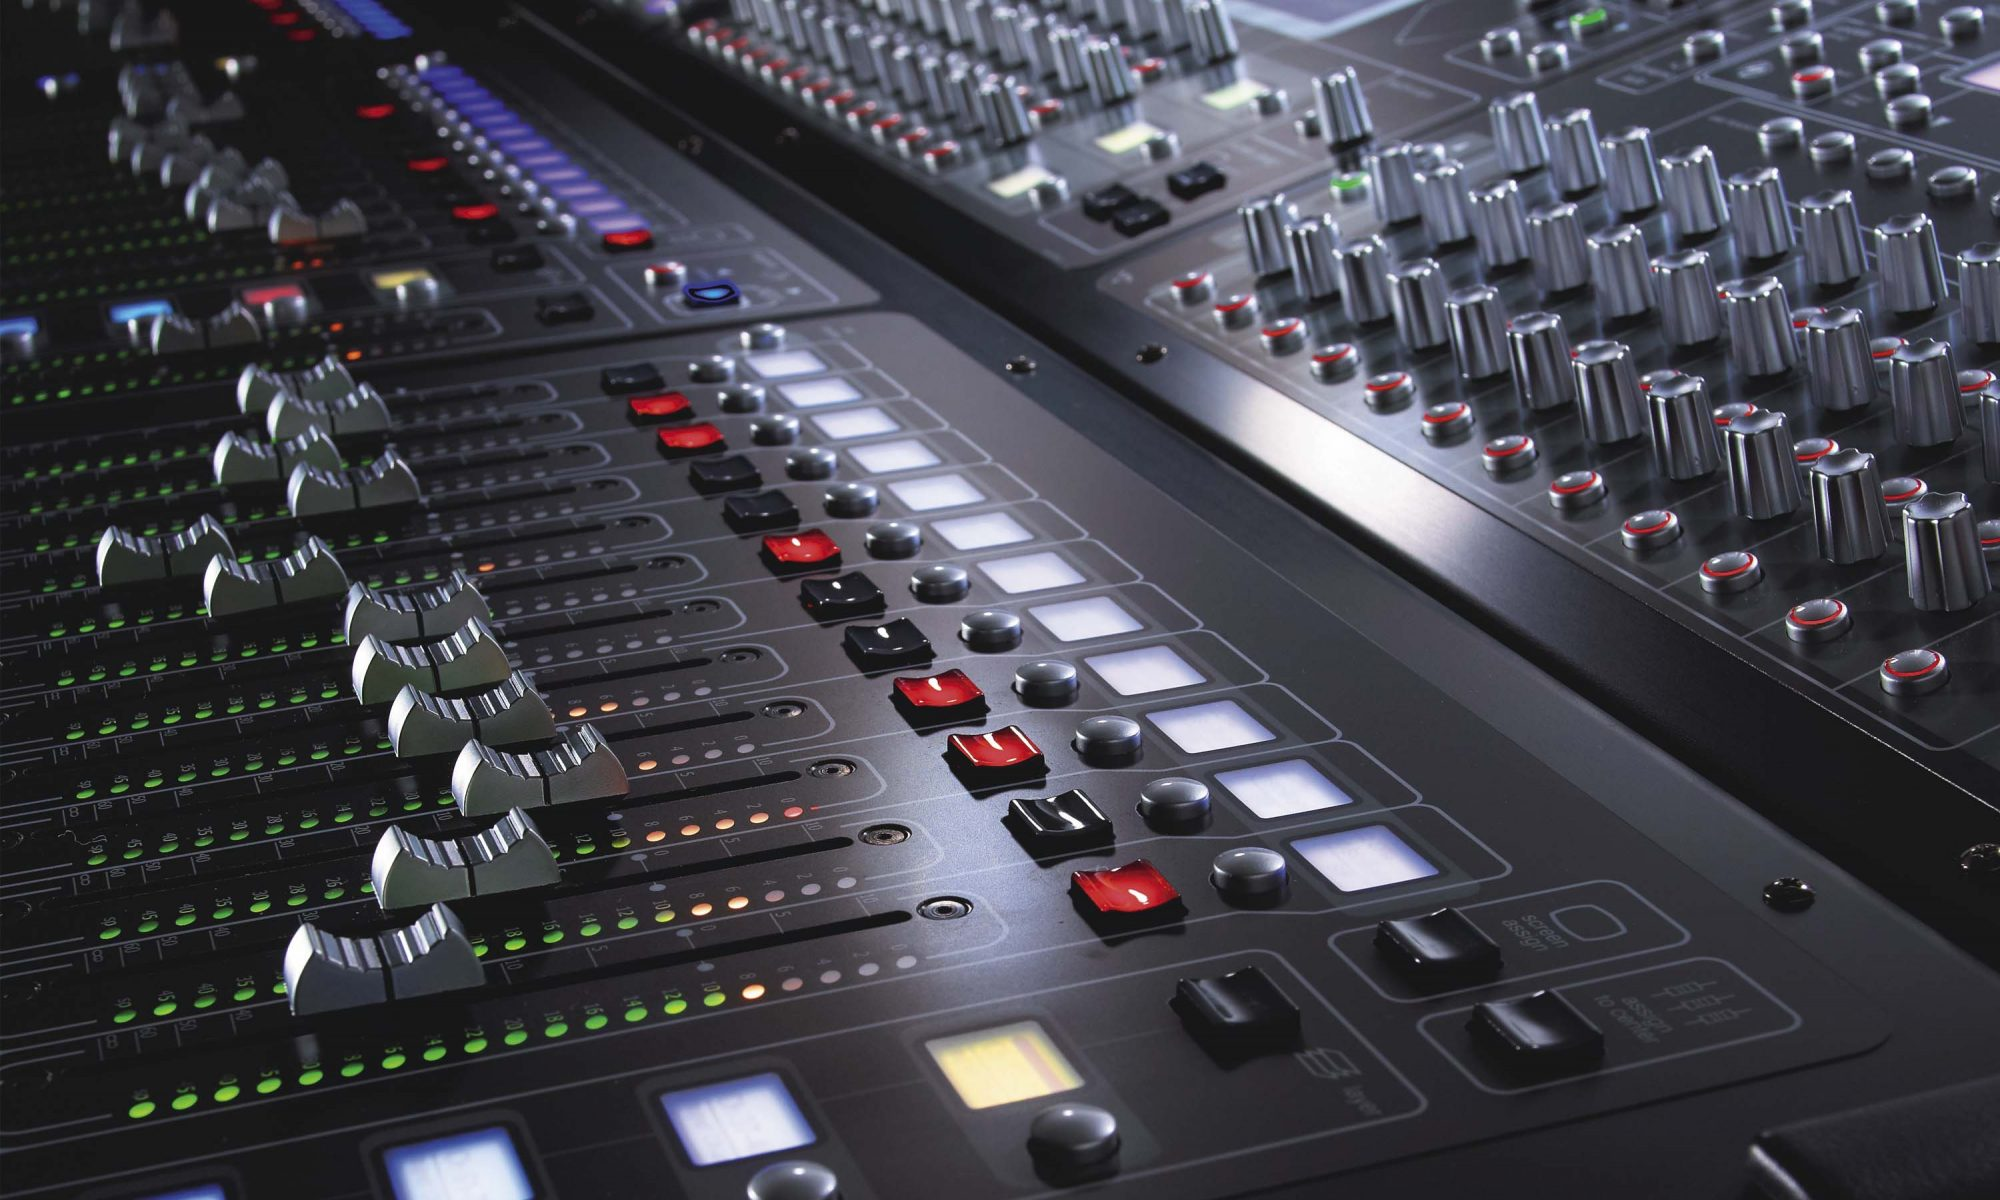 Smart AudioVisual